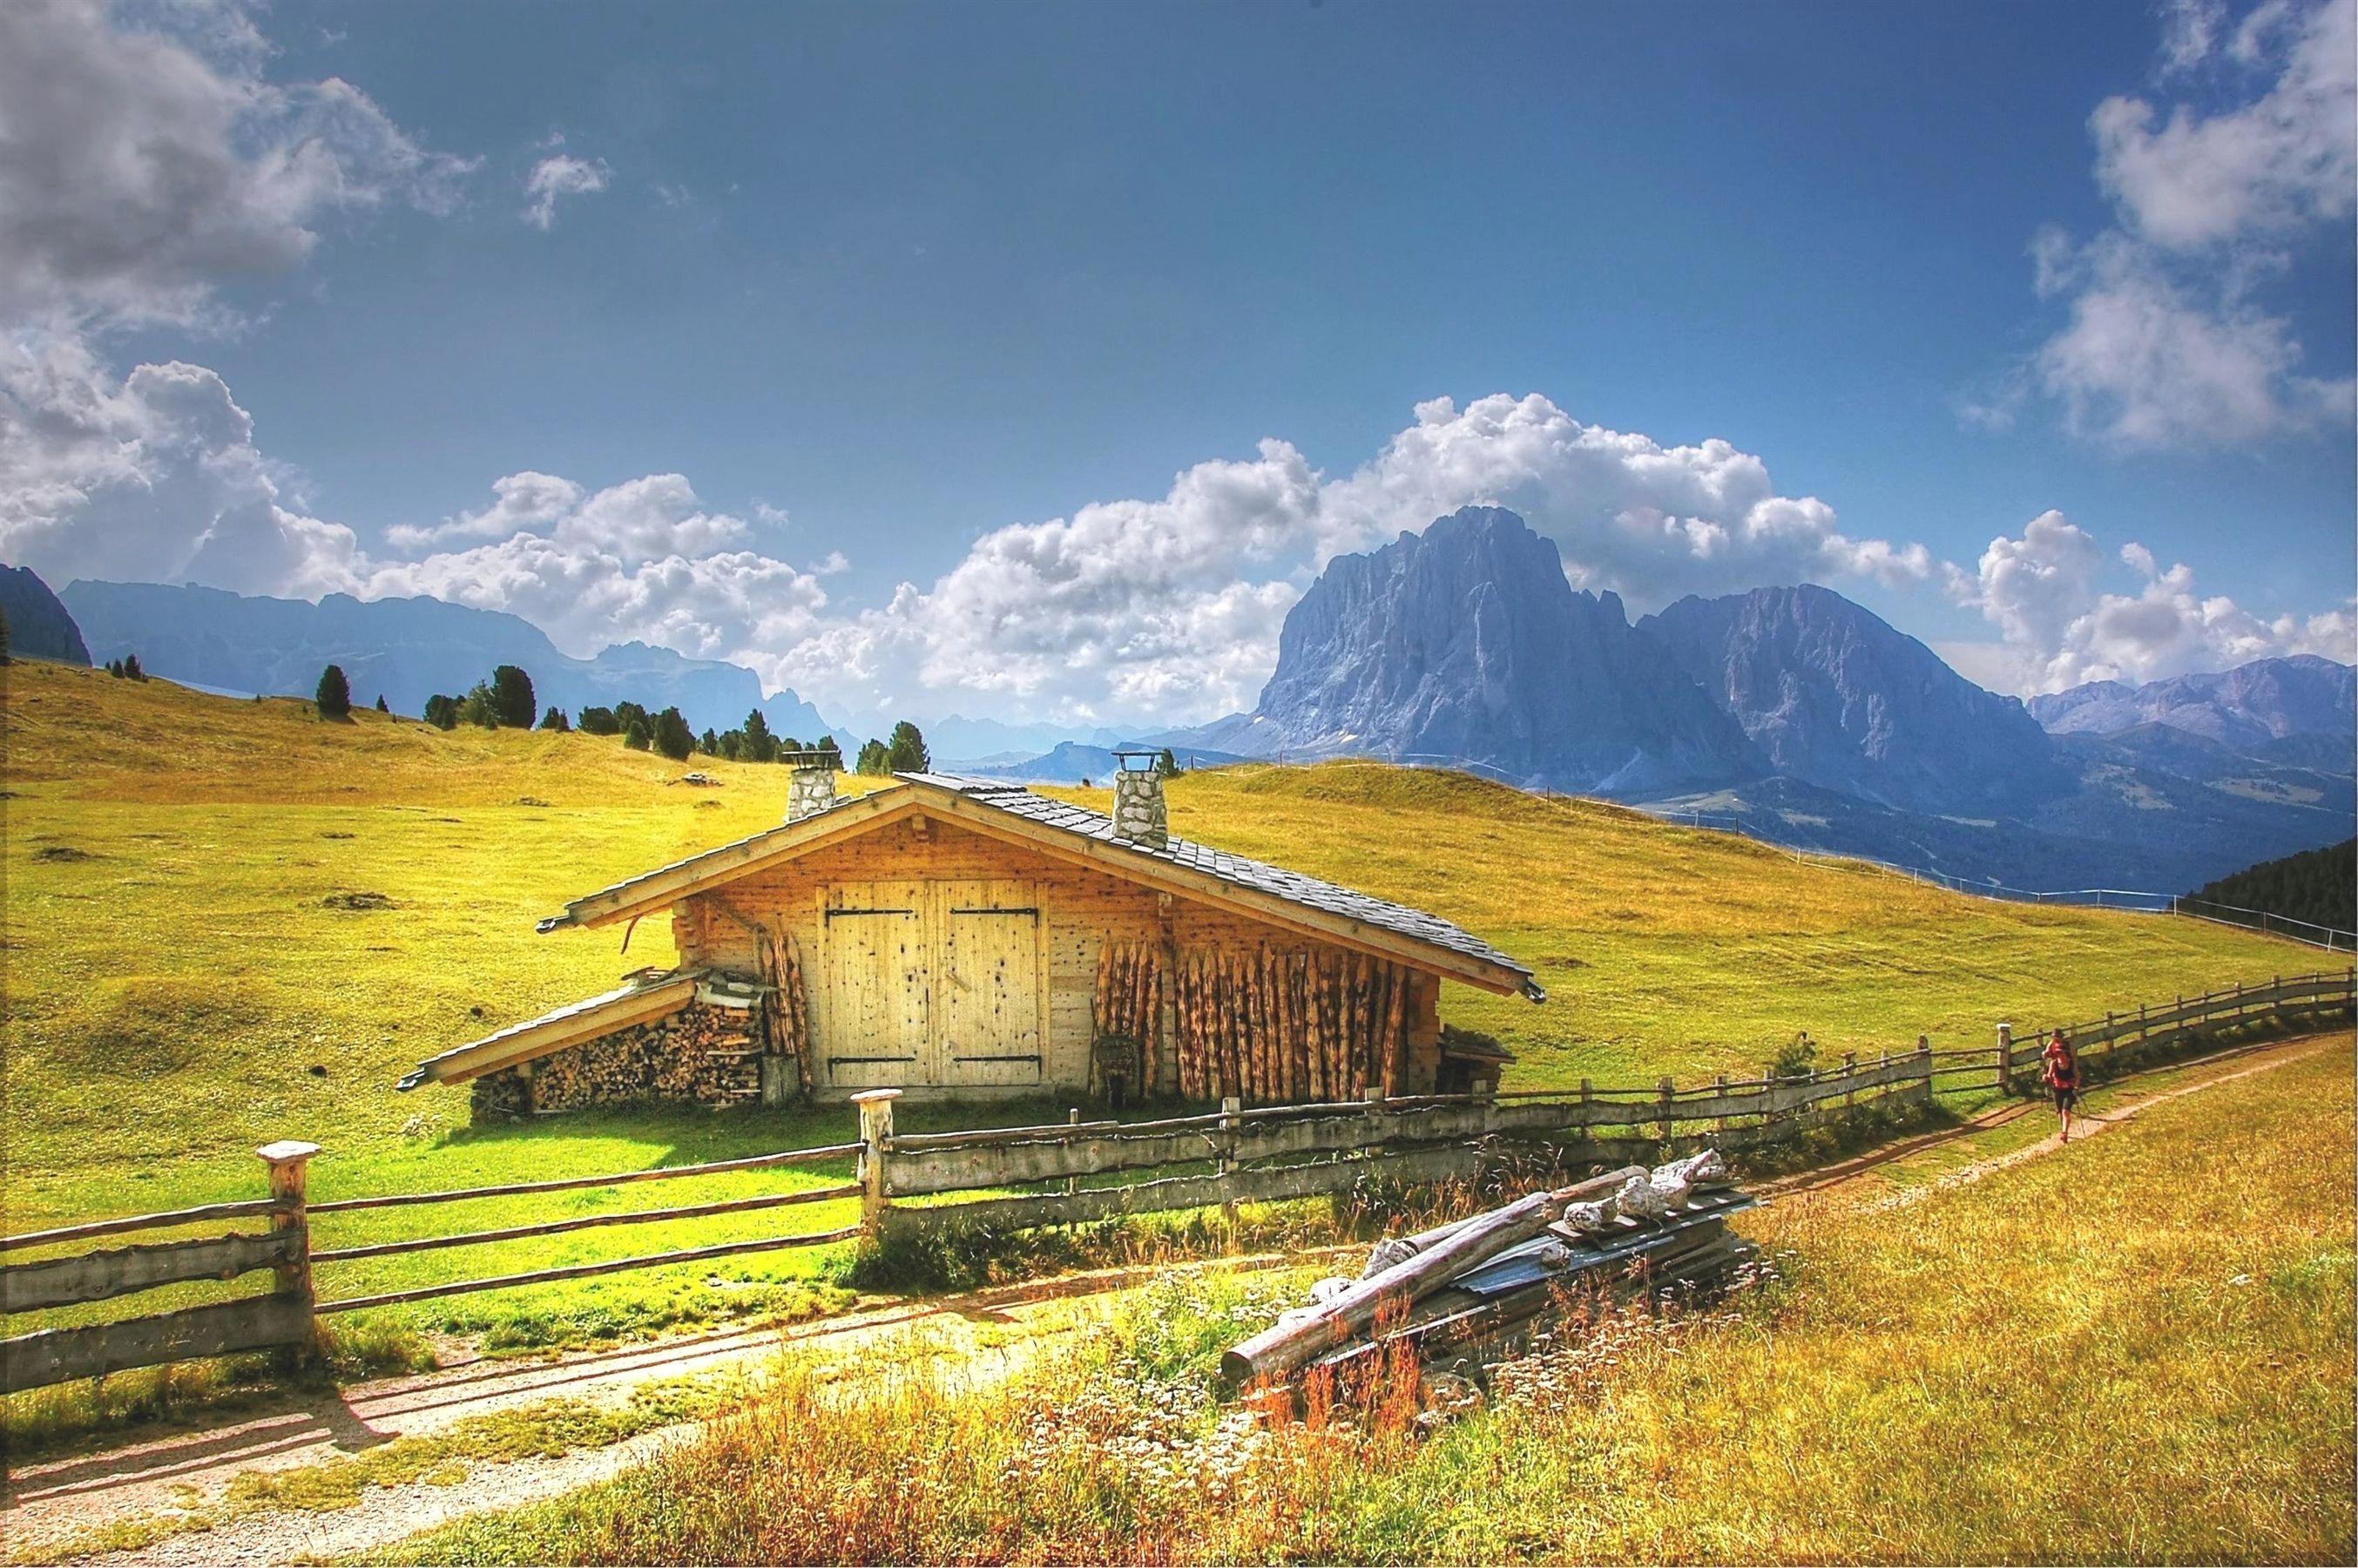 landscape your garden online_1060_20190916081748_65